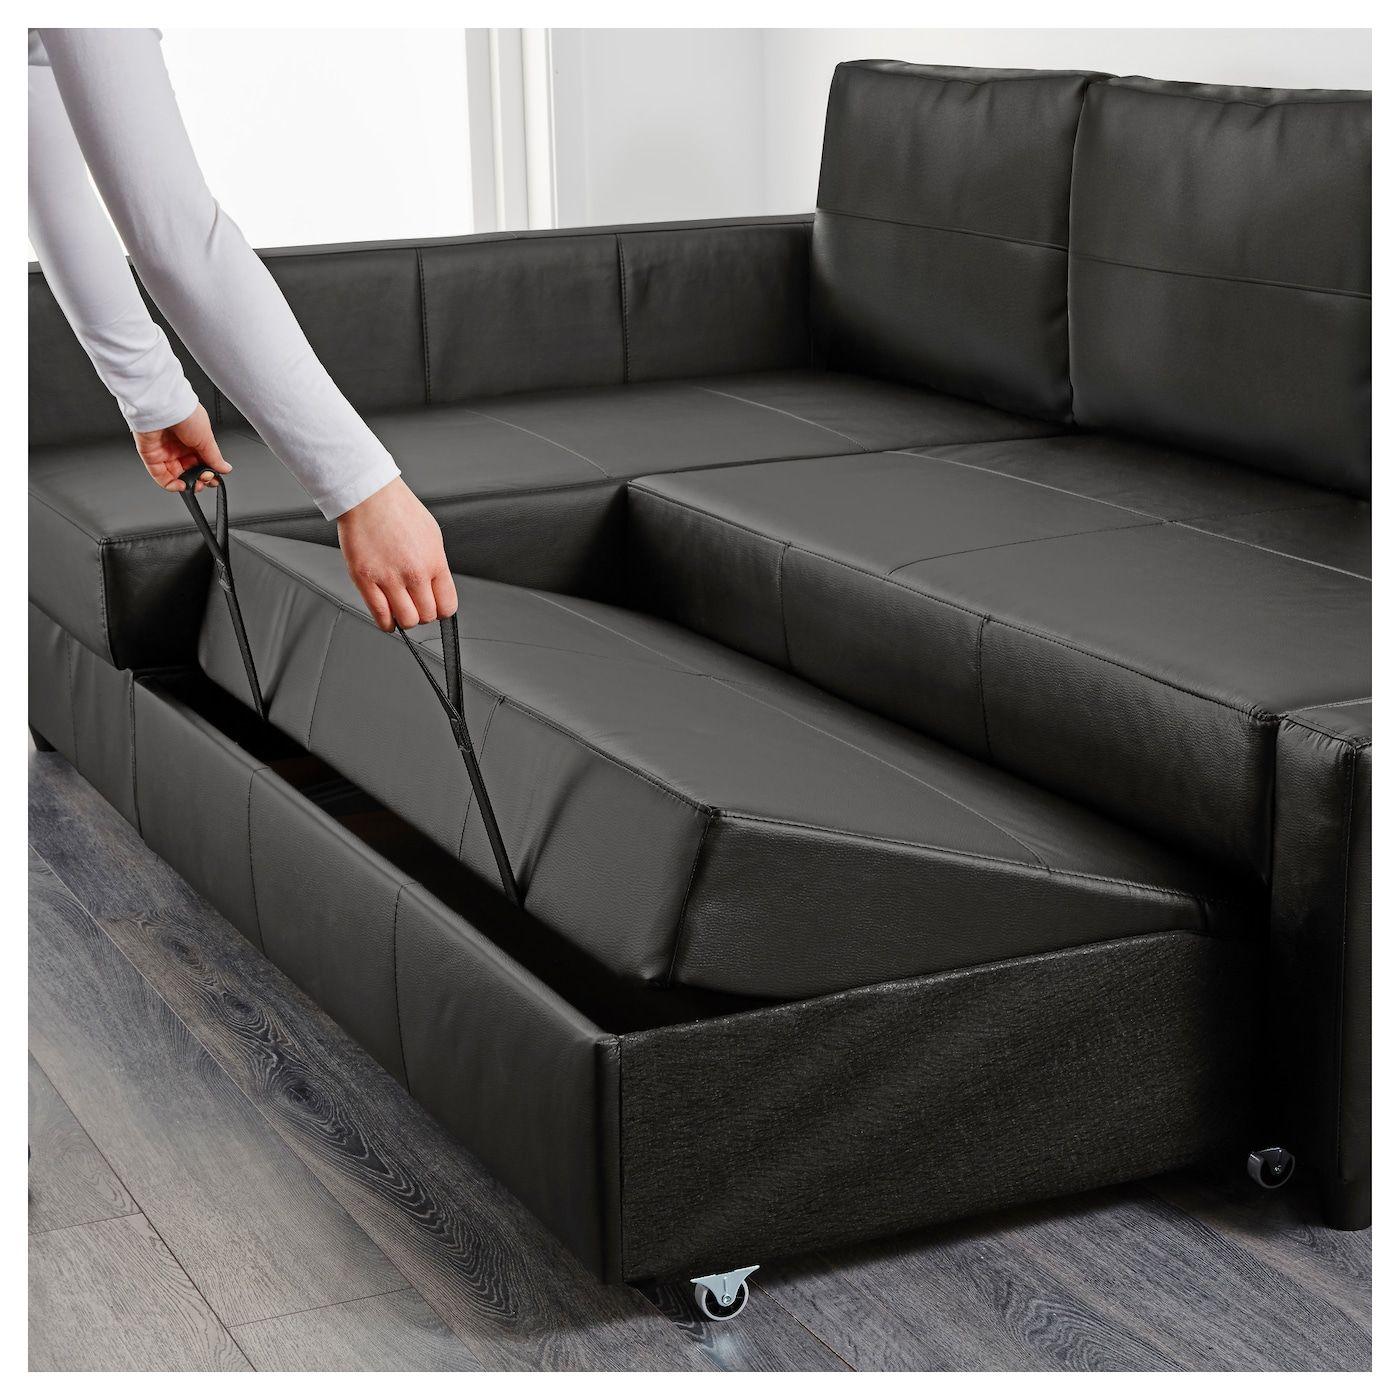 Friheten Sleeper Sectional 3 Seat W Storage Bomstad Black Ikea In 2021 Corner Sofa Bed With Storage Sofa Bed With Storage Leather Sofa Bed